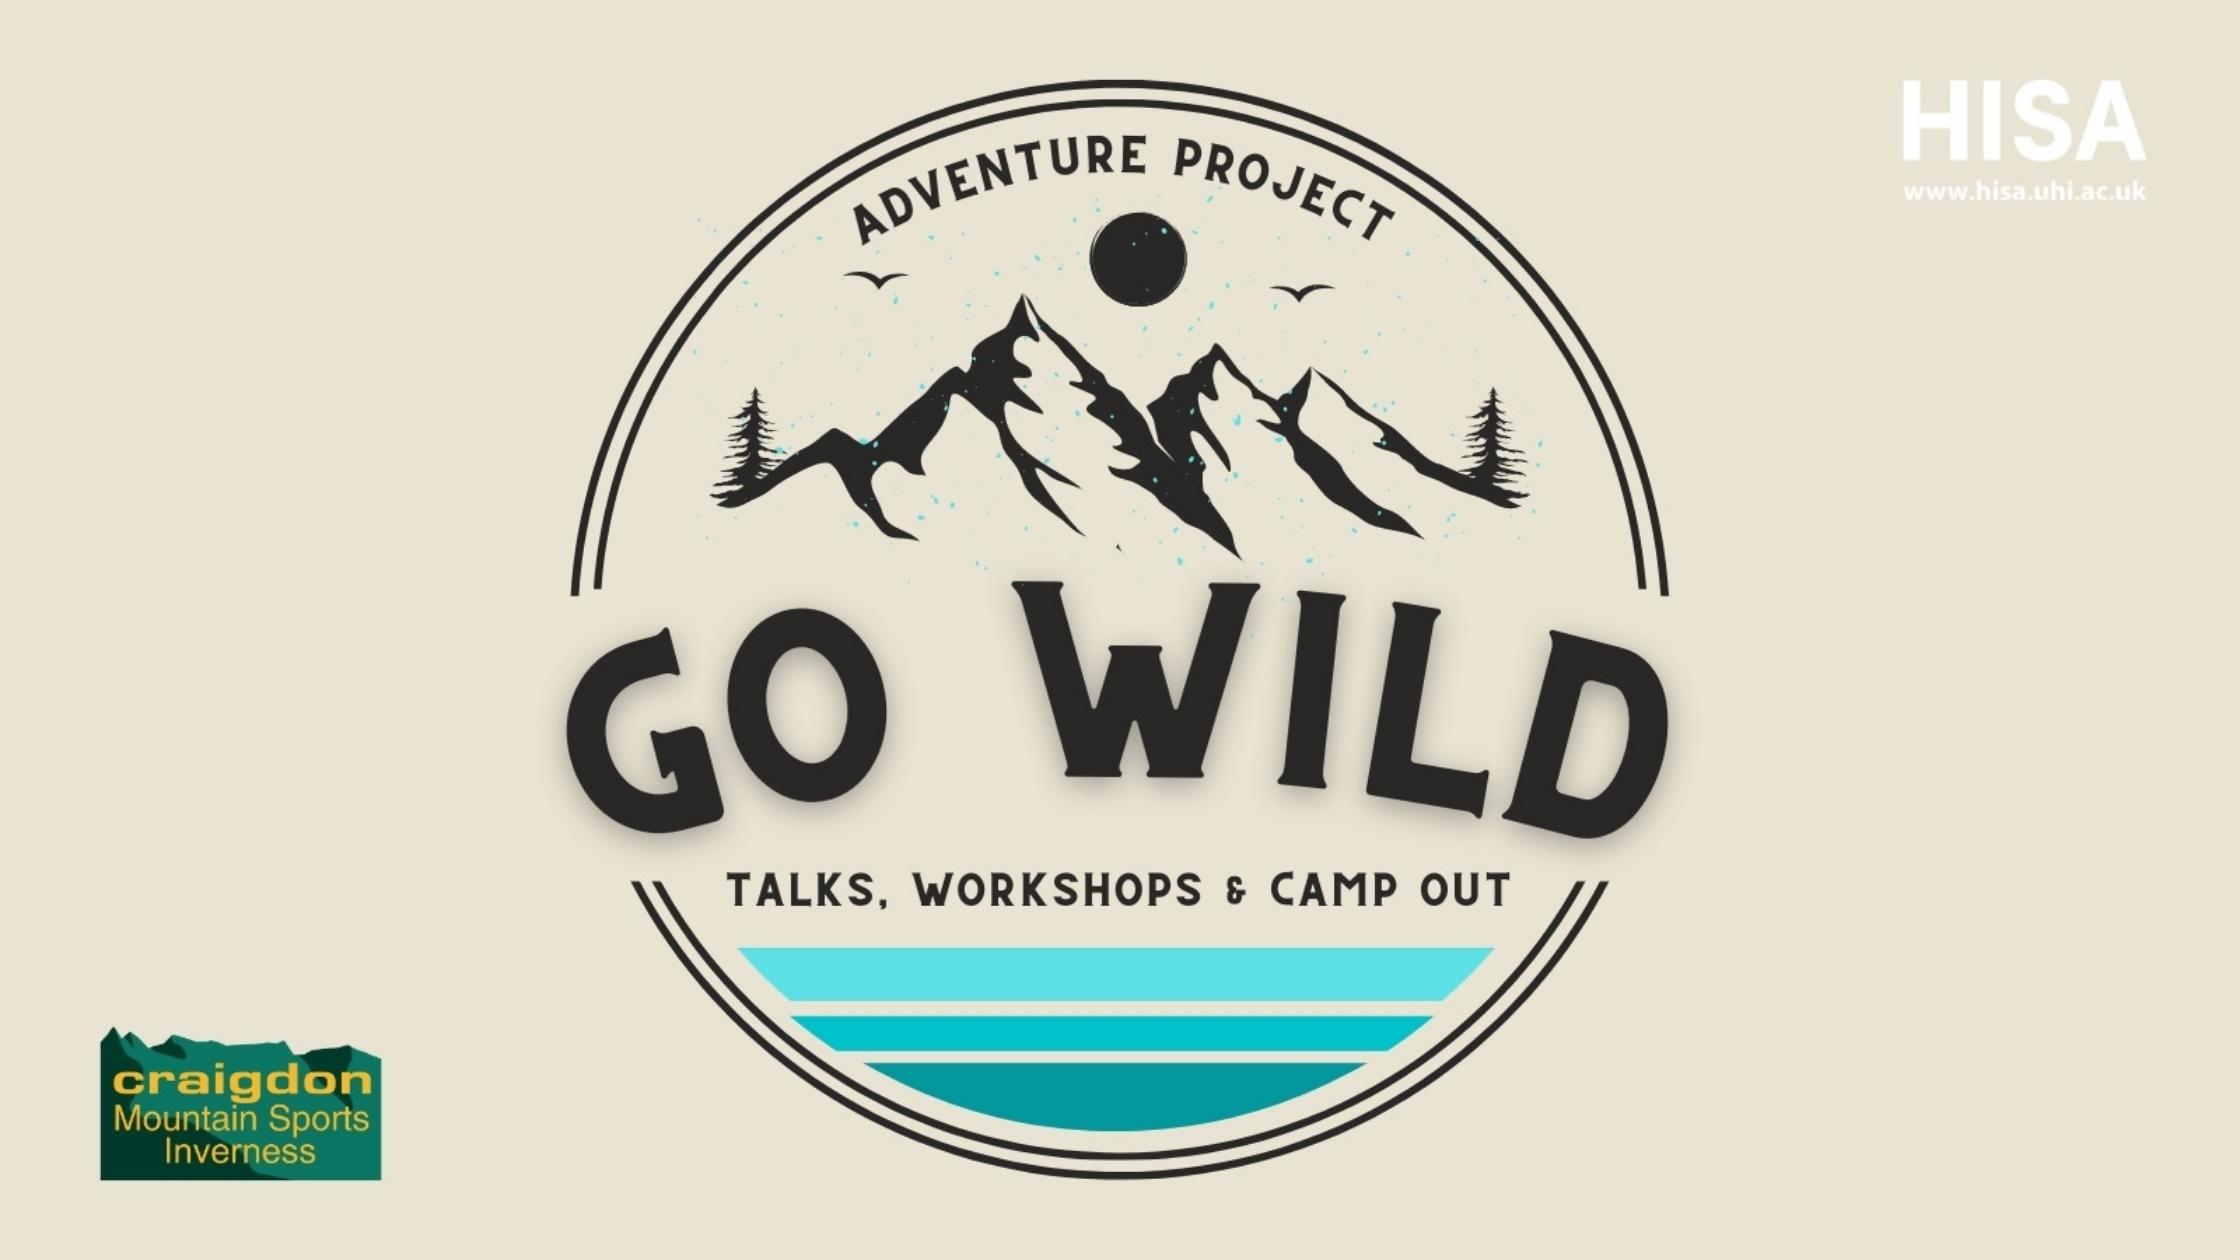 Go wild website banner